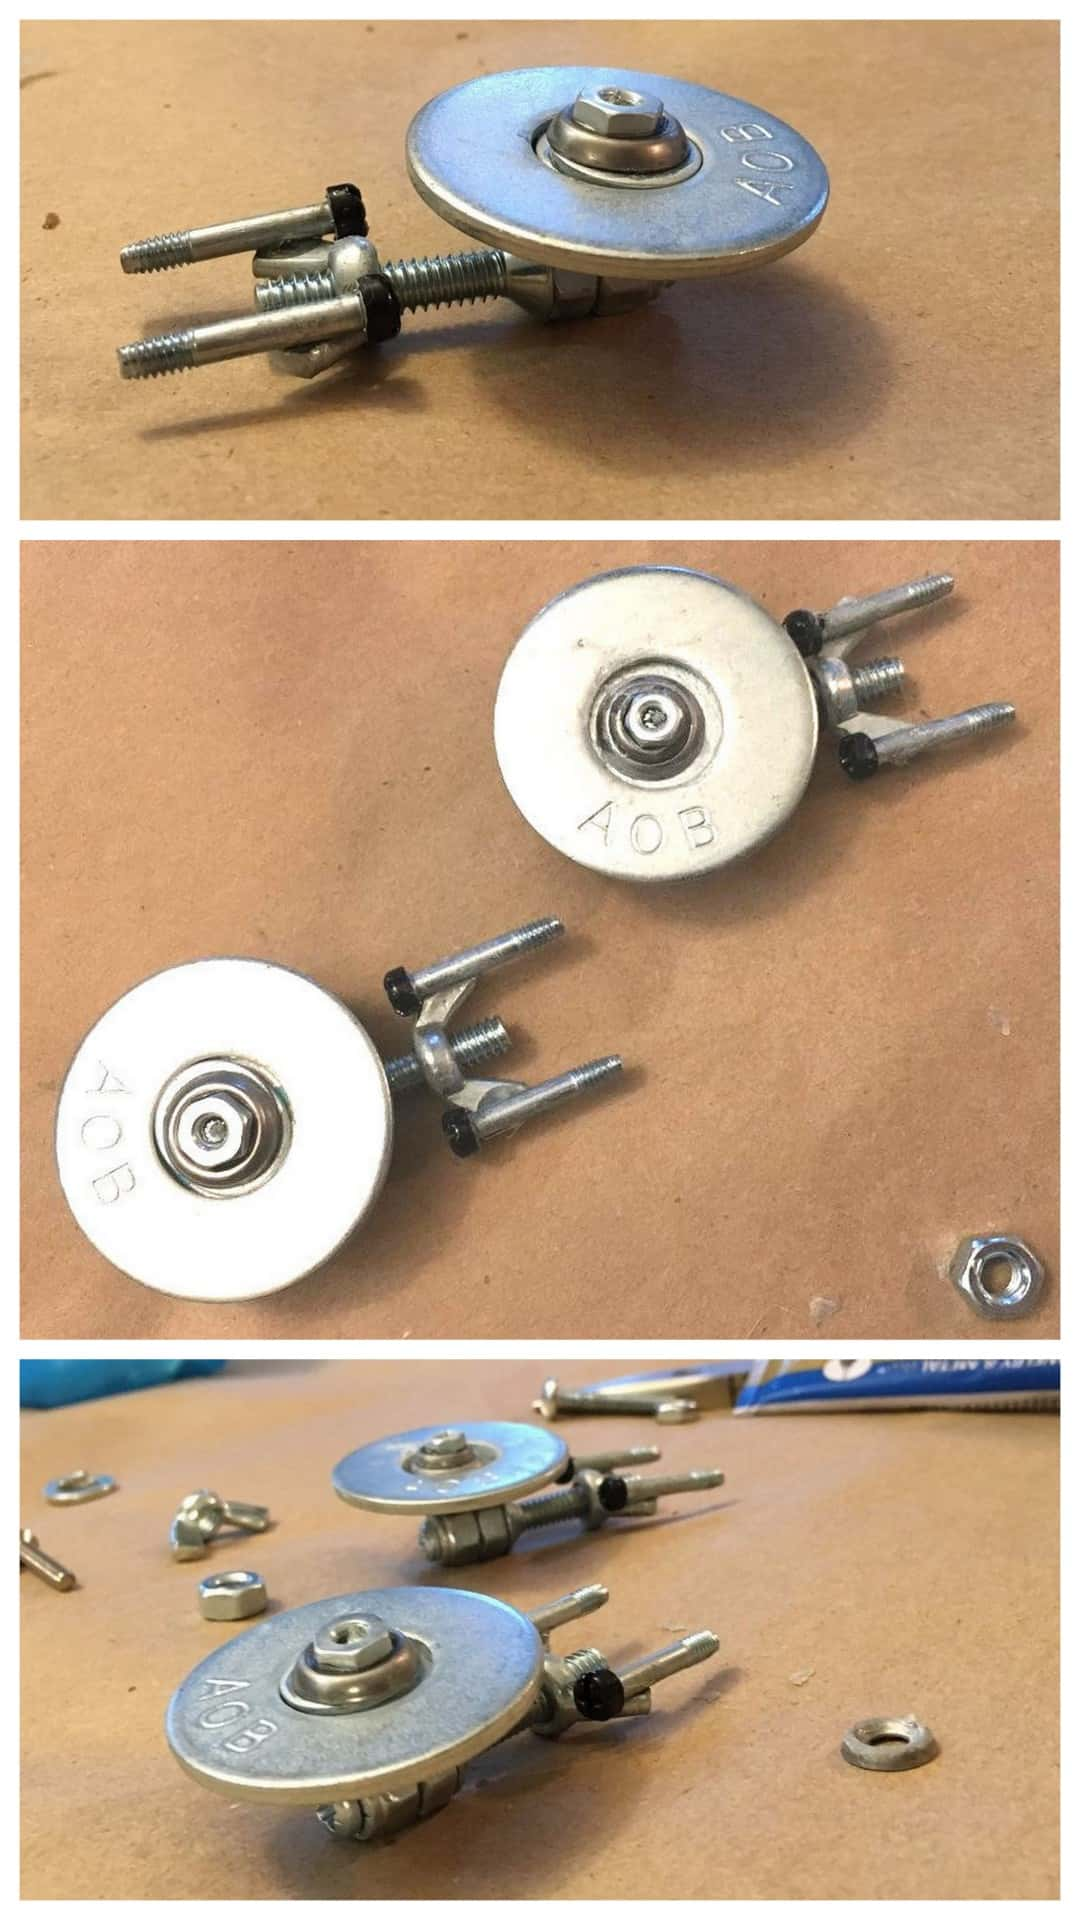 Washer and screw mini Star Trek Enterprise